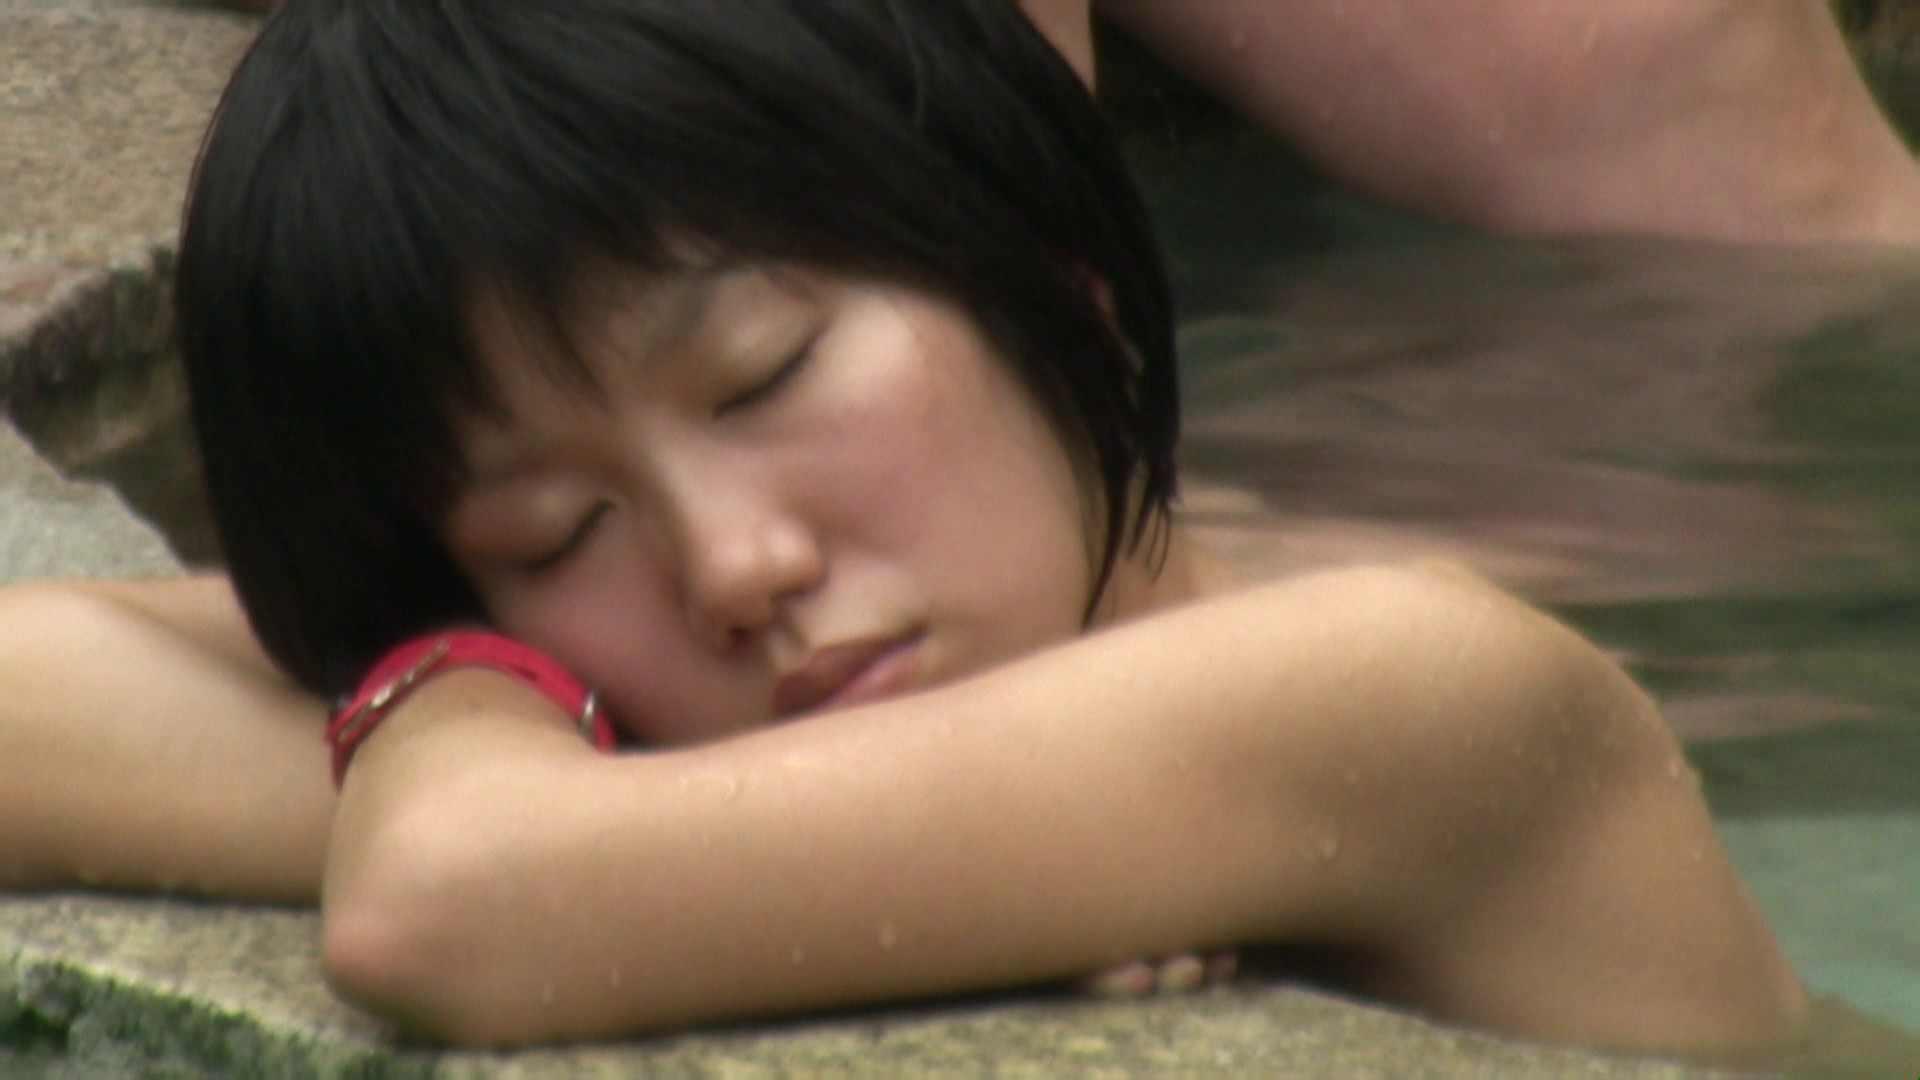 Aquaな露天風呂Vol.37【VIP】 0 | 0  28連発 11